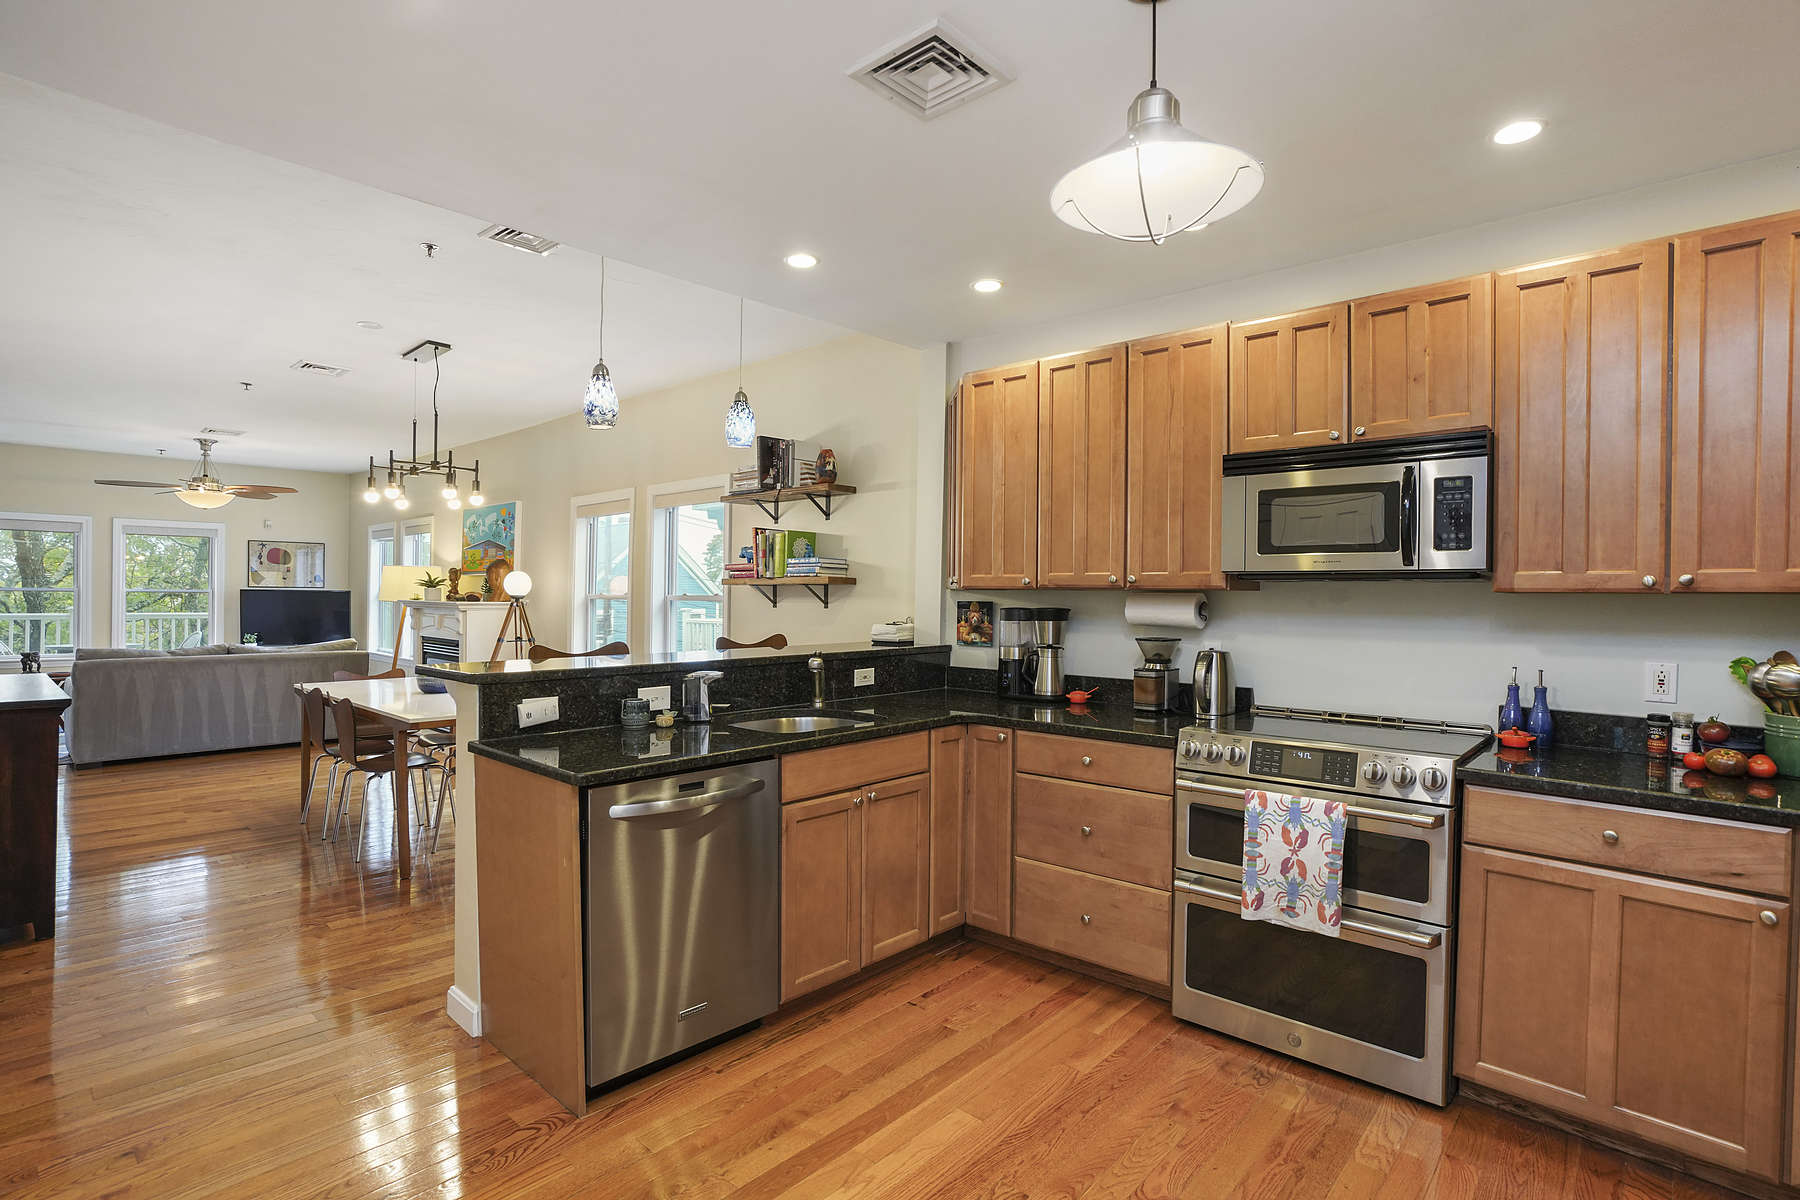 Condominiums 为 销售 在 34 Madison Street, Unit 2 34 Madison St 2 Somerville, 马萨诸塞州 02143 美国